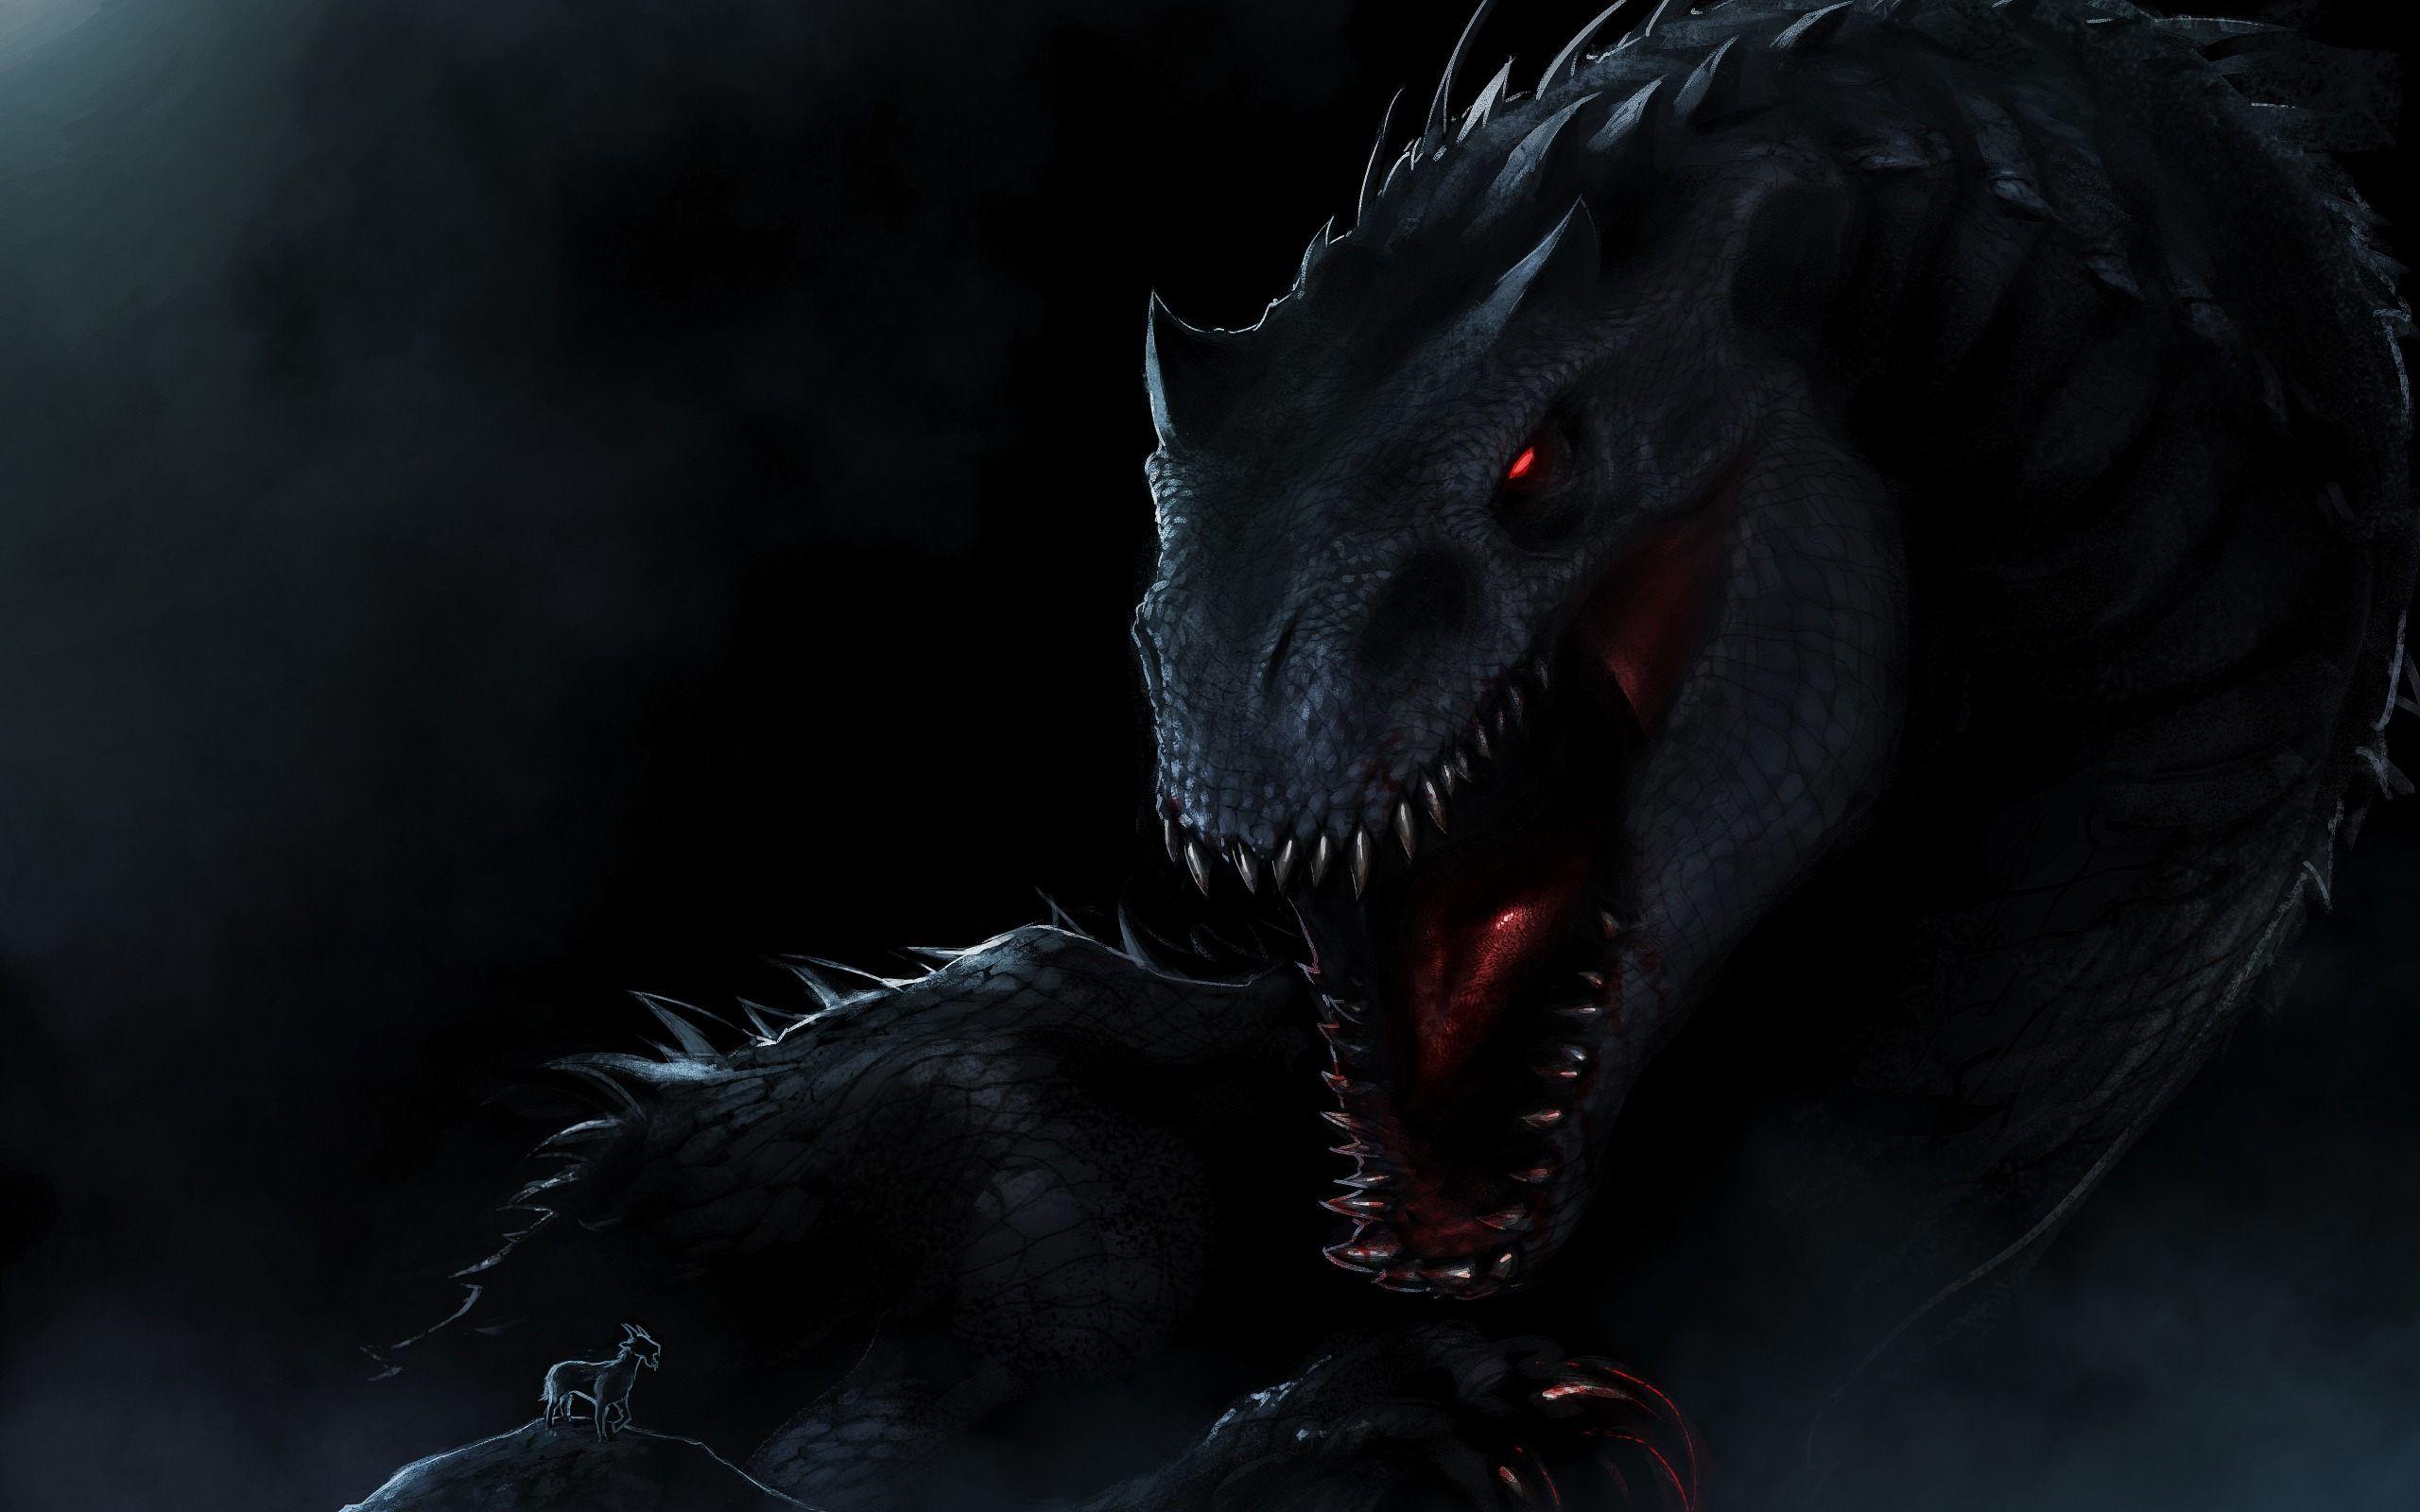 Jurassic World Indominus Rex Fan Art Wallpaper HD Download